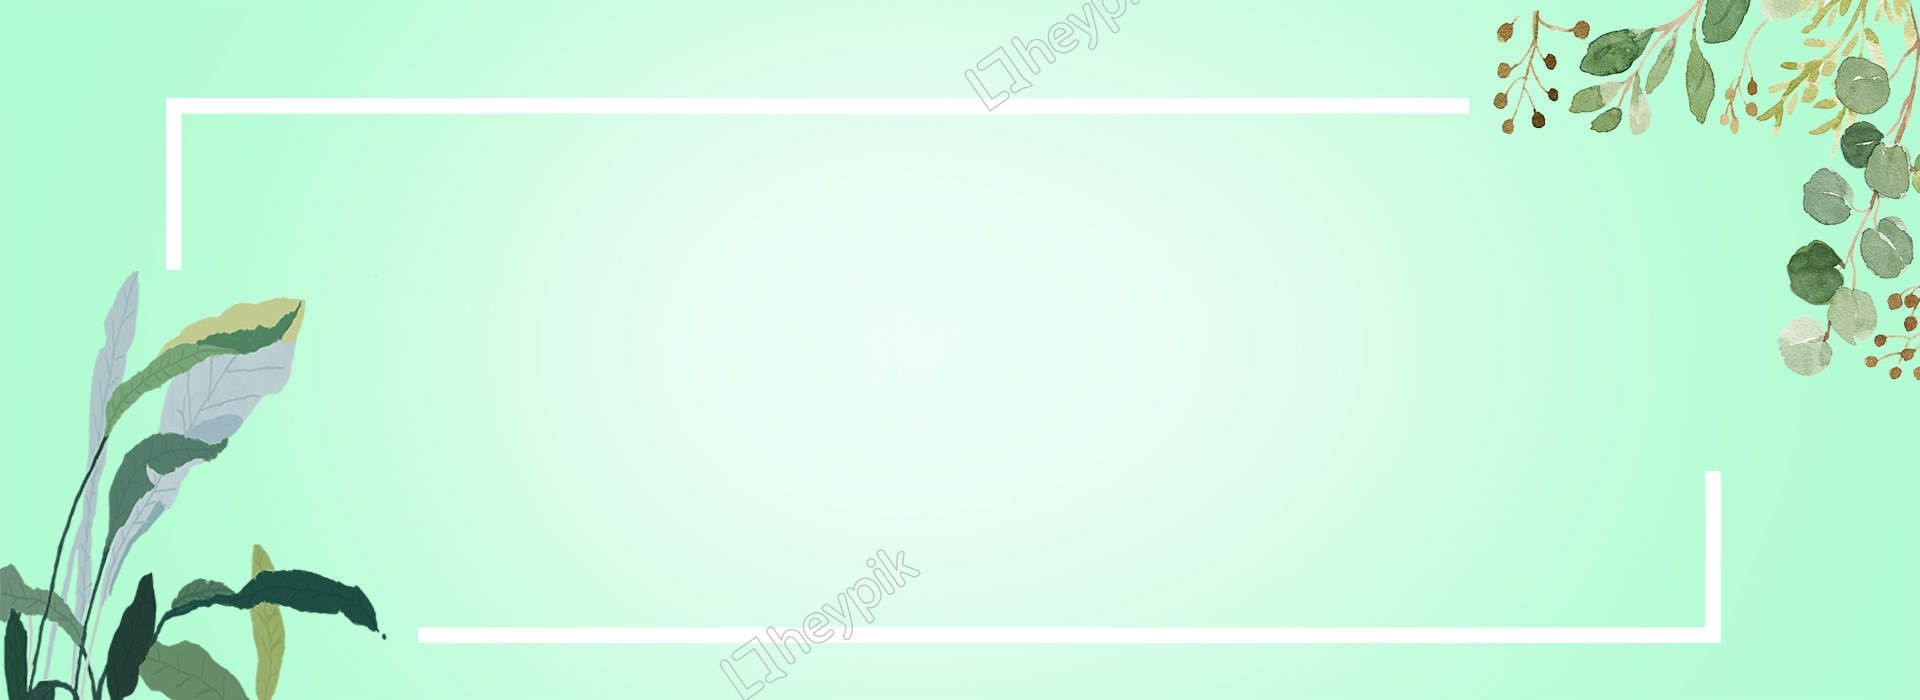 Mint Green Fresh Elegant Background